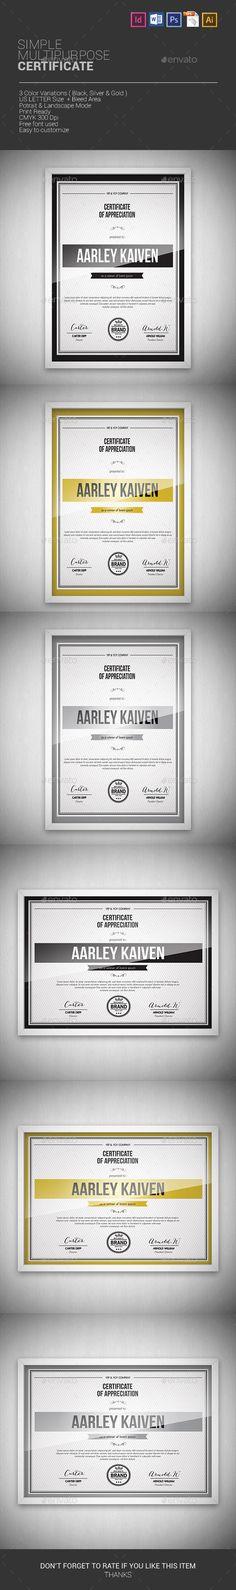 Simple Multipurpose Certificates - Certificates Stationery